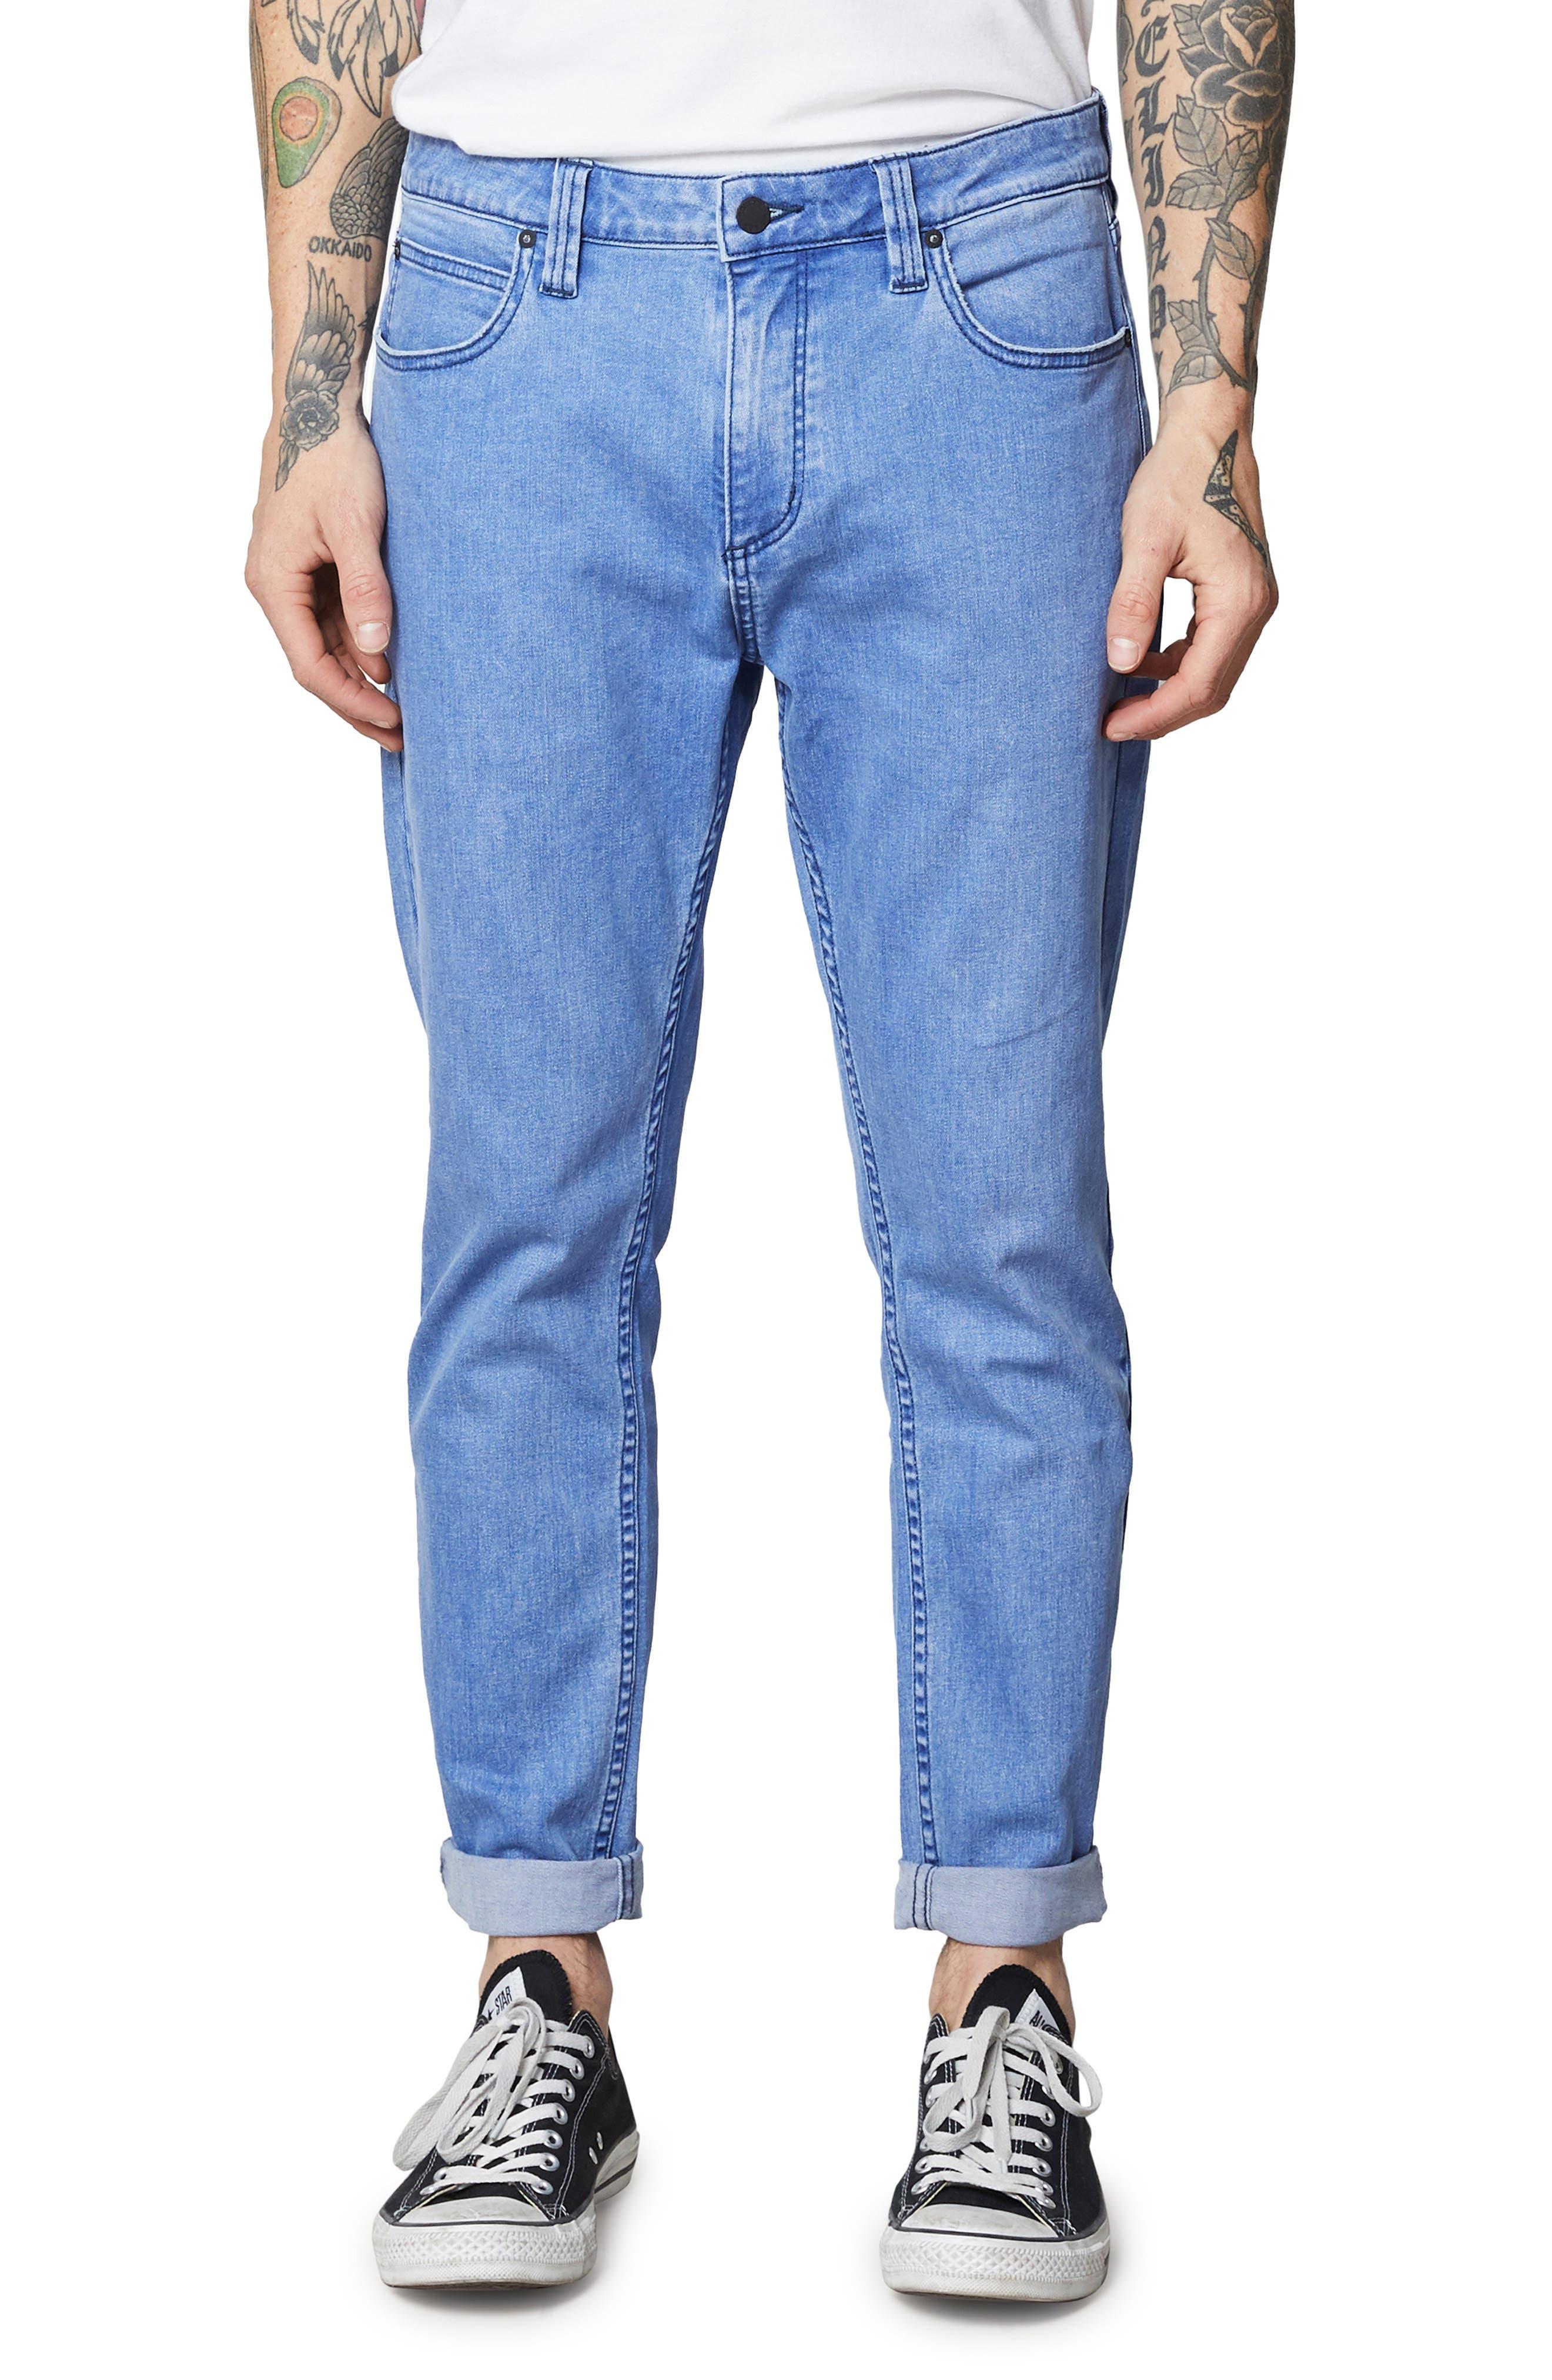 Rollies Slim Fit Jeans,                         Main,                         color, BOLD BLUE